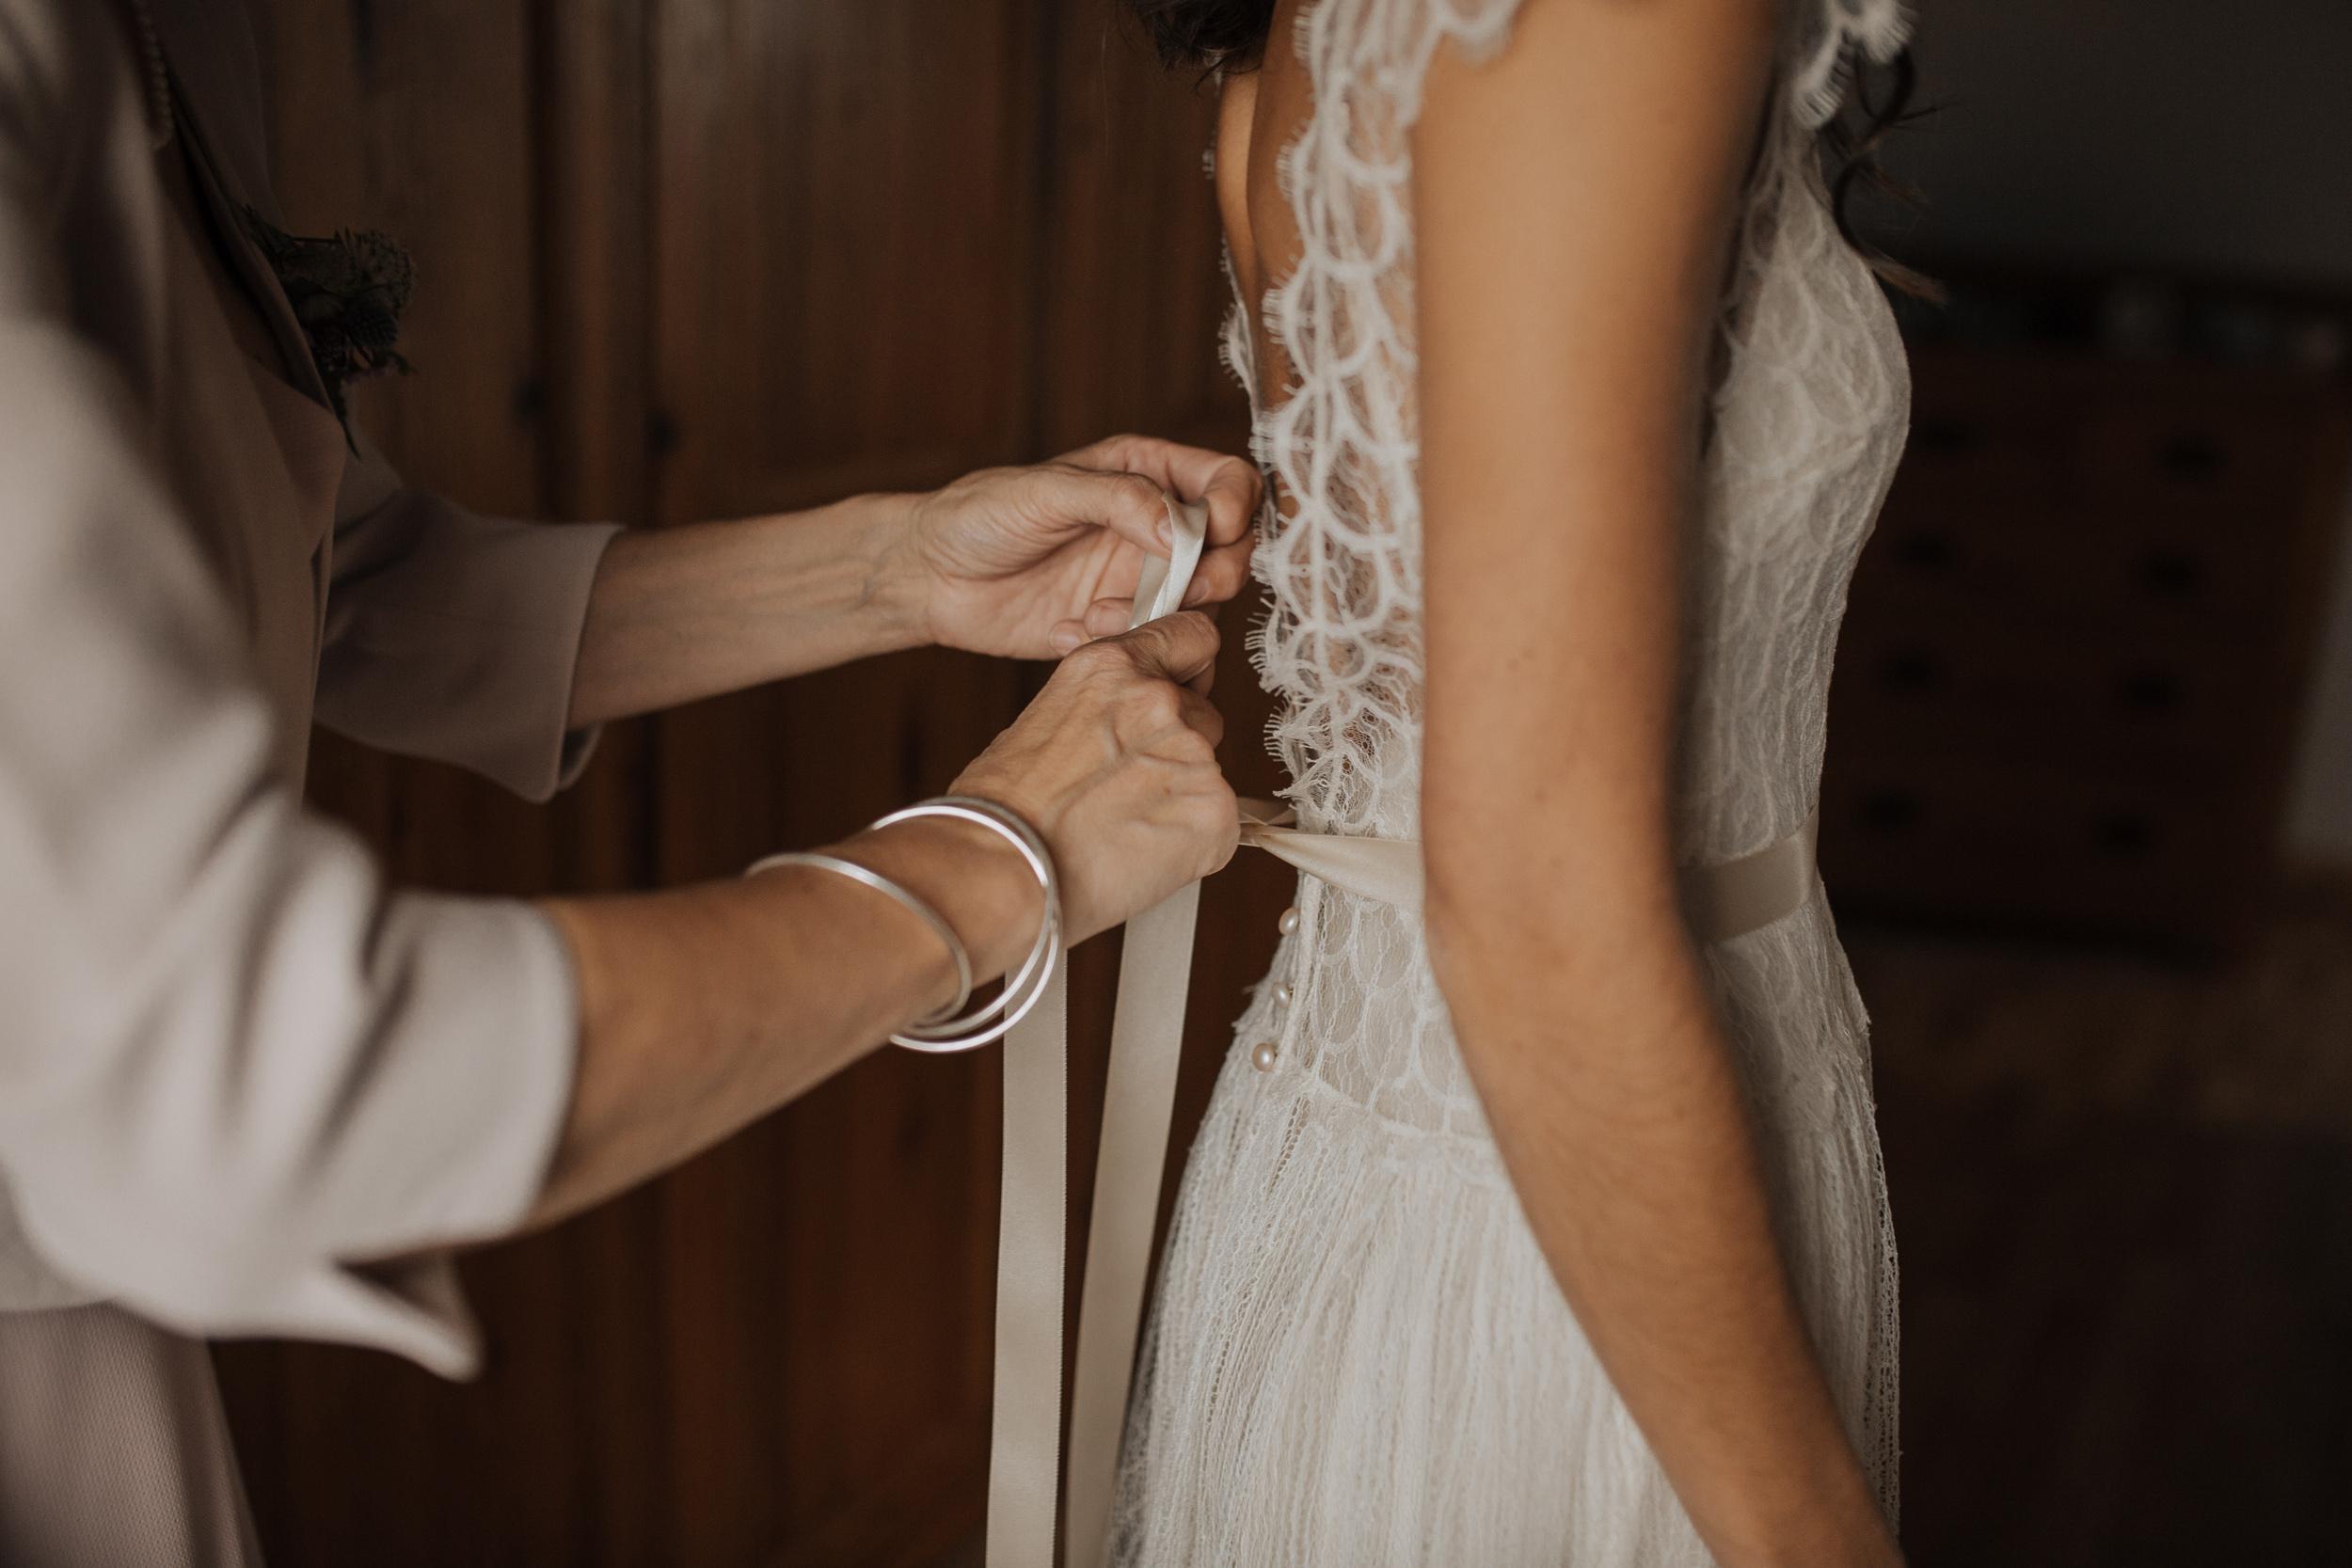 Joasia-Kate-Beaumont-Bohemian-Lace-Wedding-Dress-Peak-District-Sheffield-Wedding-2.jpg